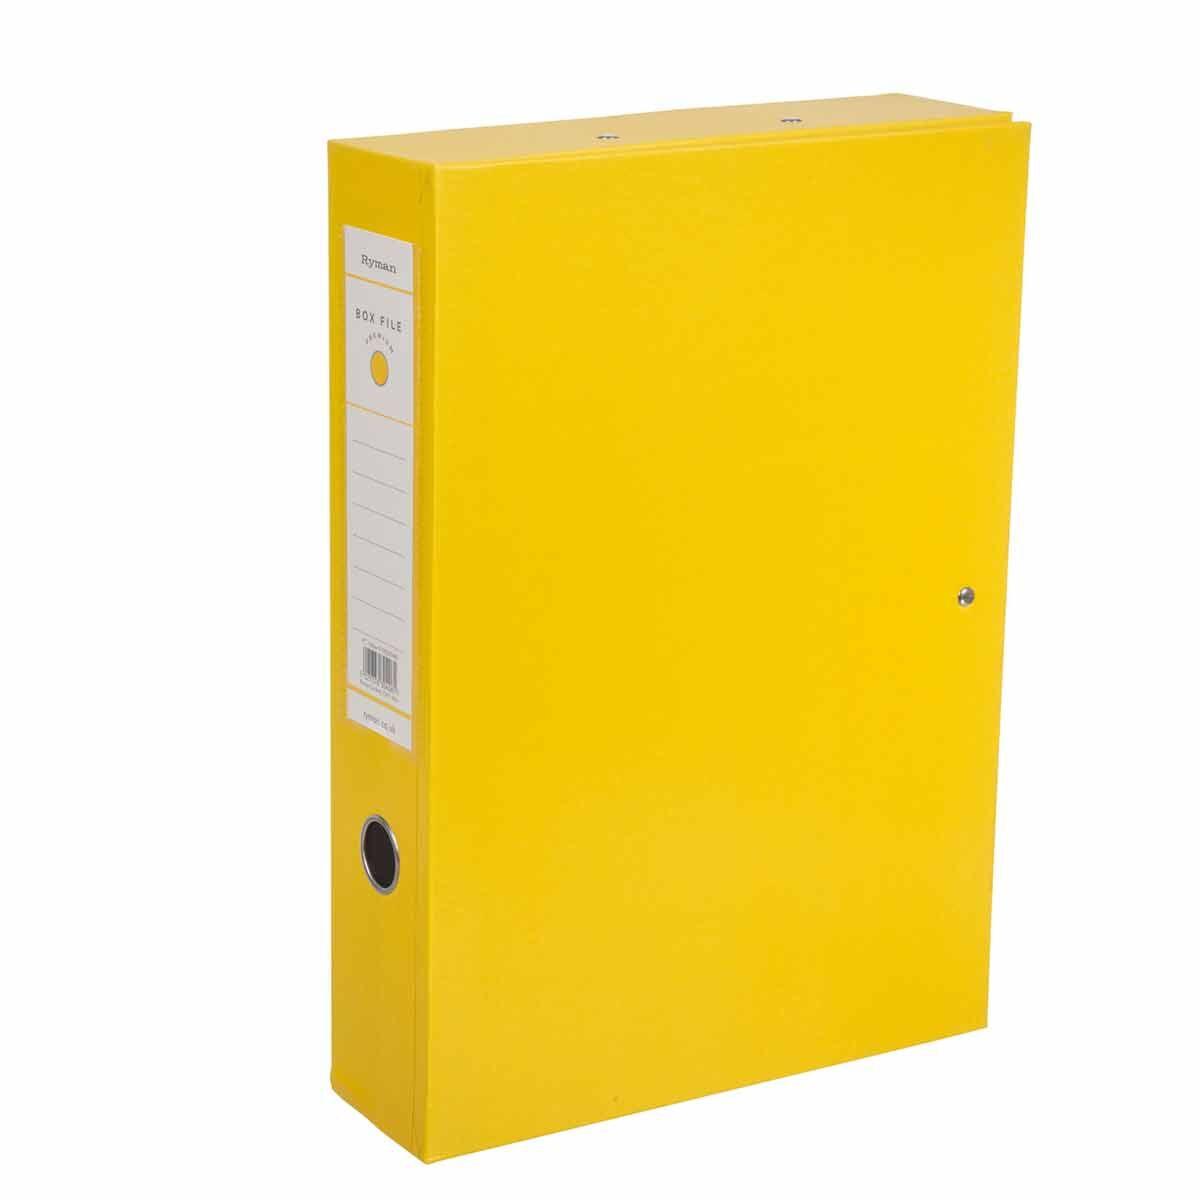 Ryman Premium Box File Foolscap Yellow